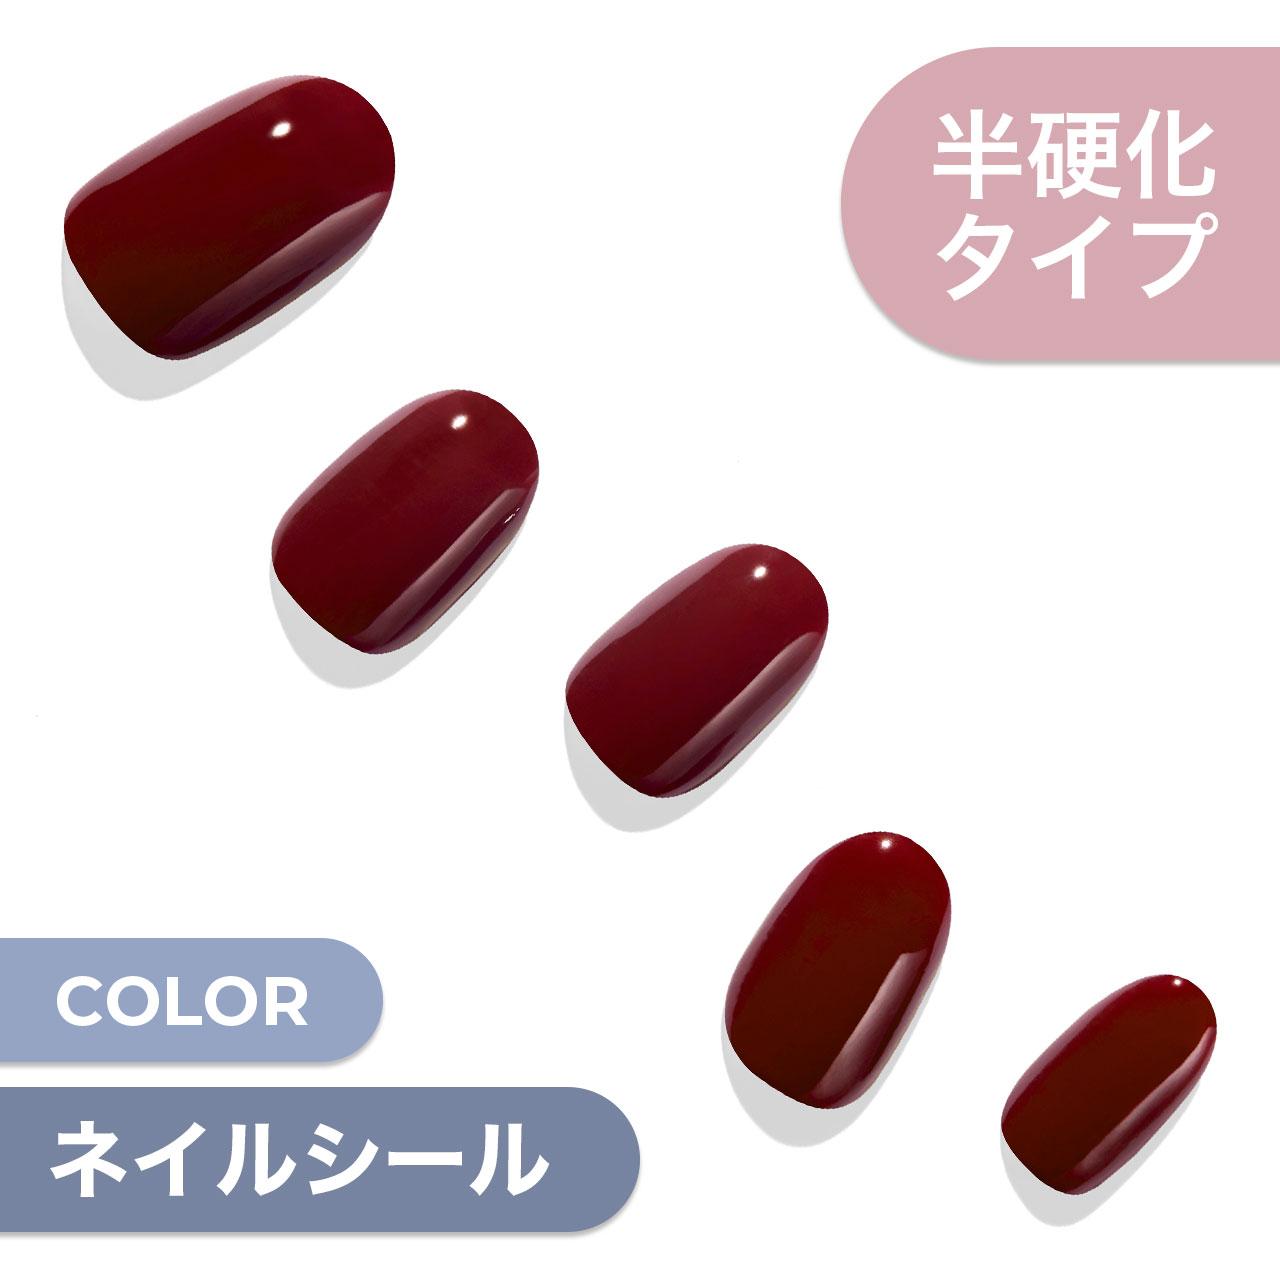 【Wine Berry】ダッシングディバグレーズ